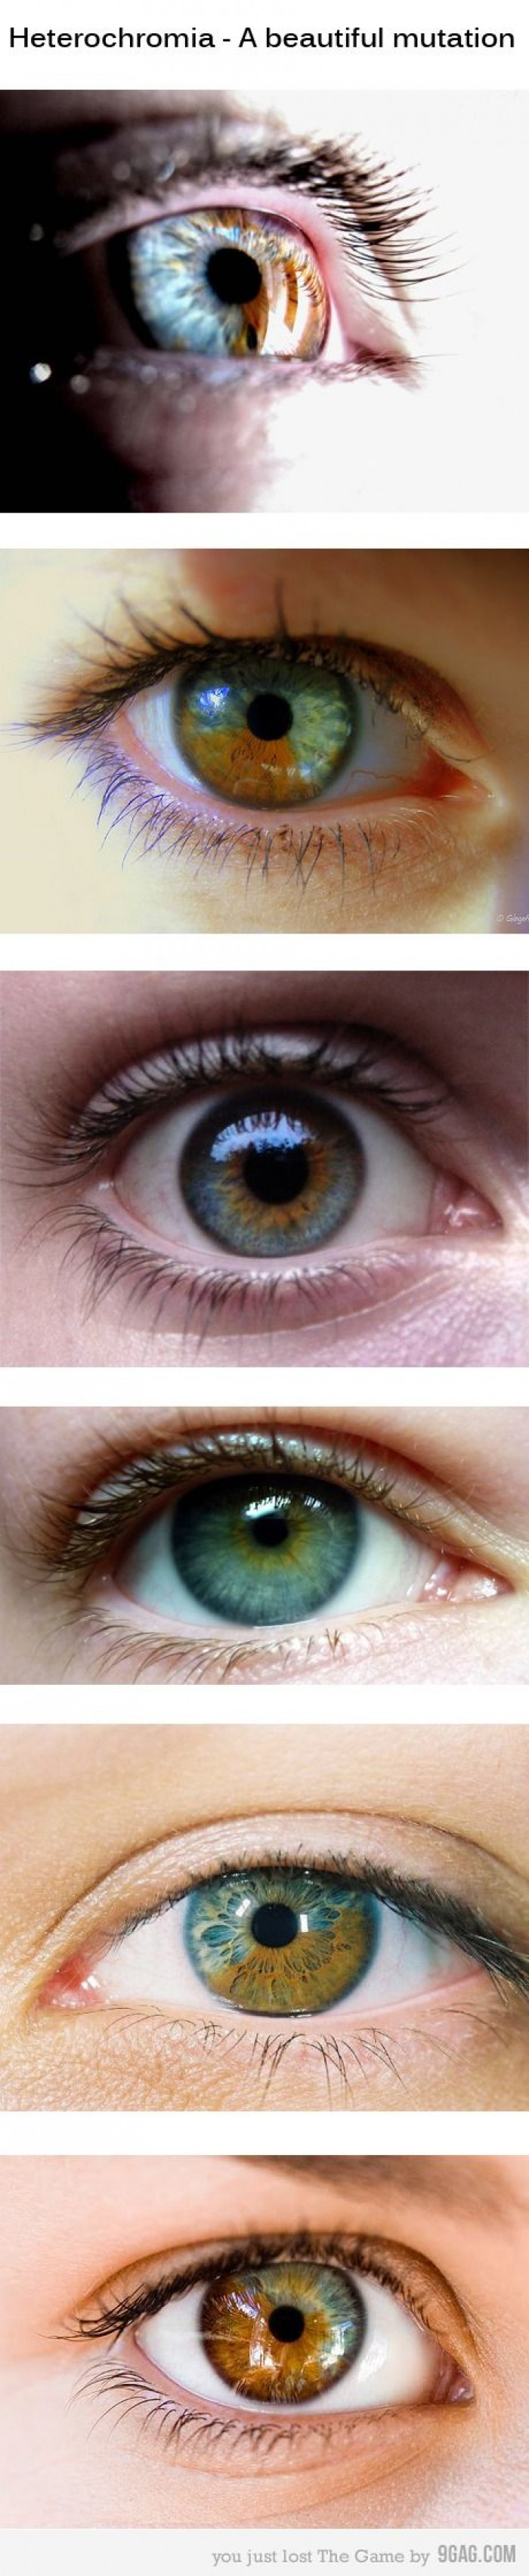 Heterochromia A Beautiful Mutation